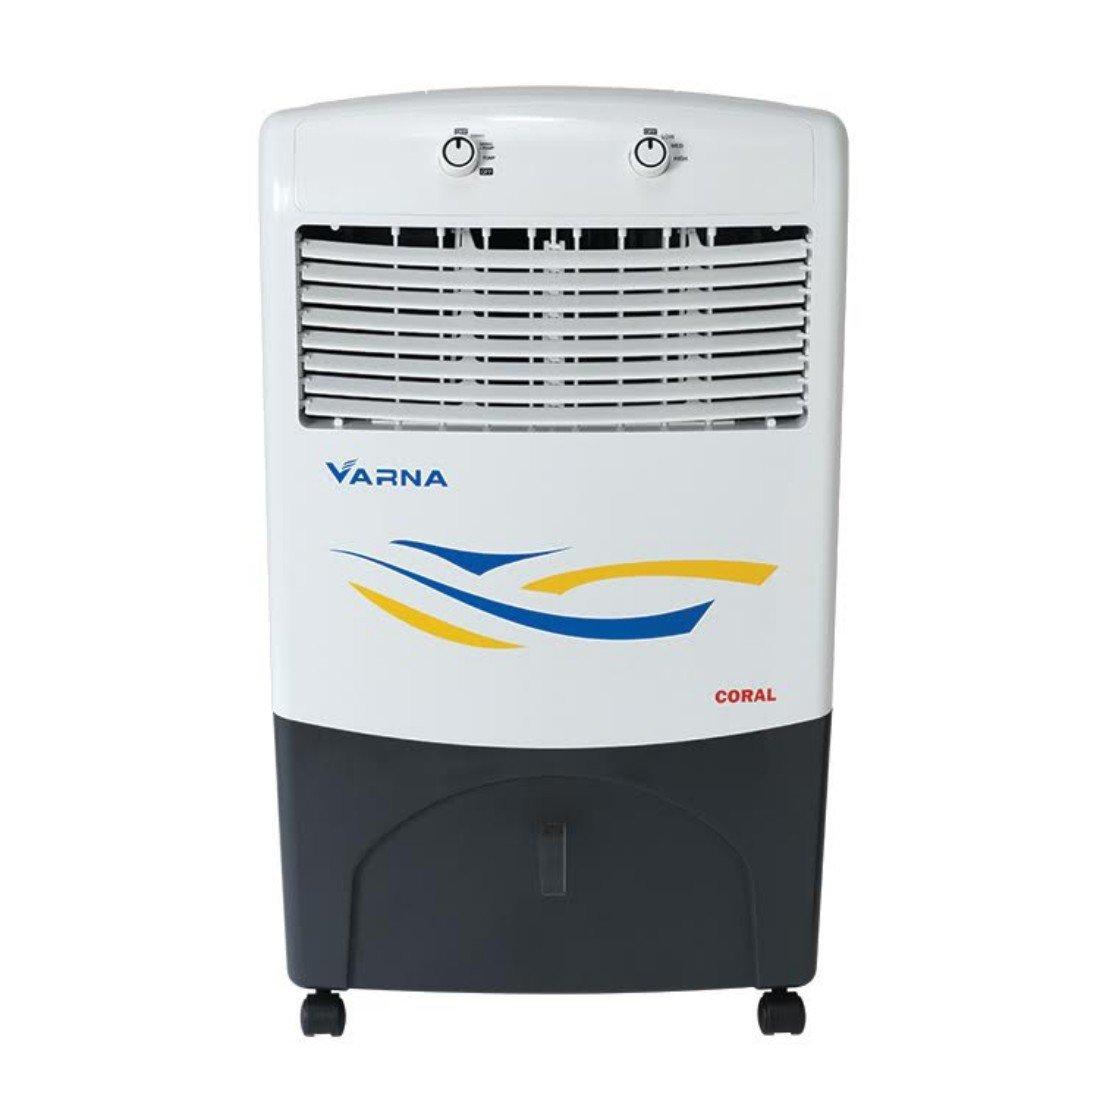 Varna CP3016B Coral Water Evaporative Personal Air Cooler - White